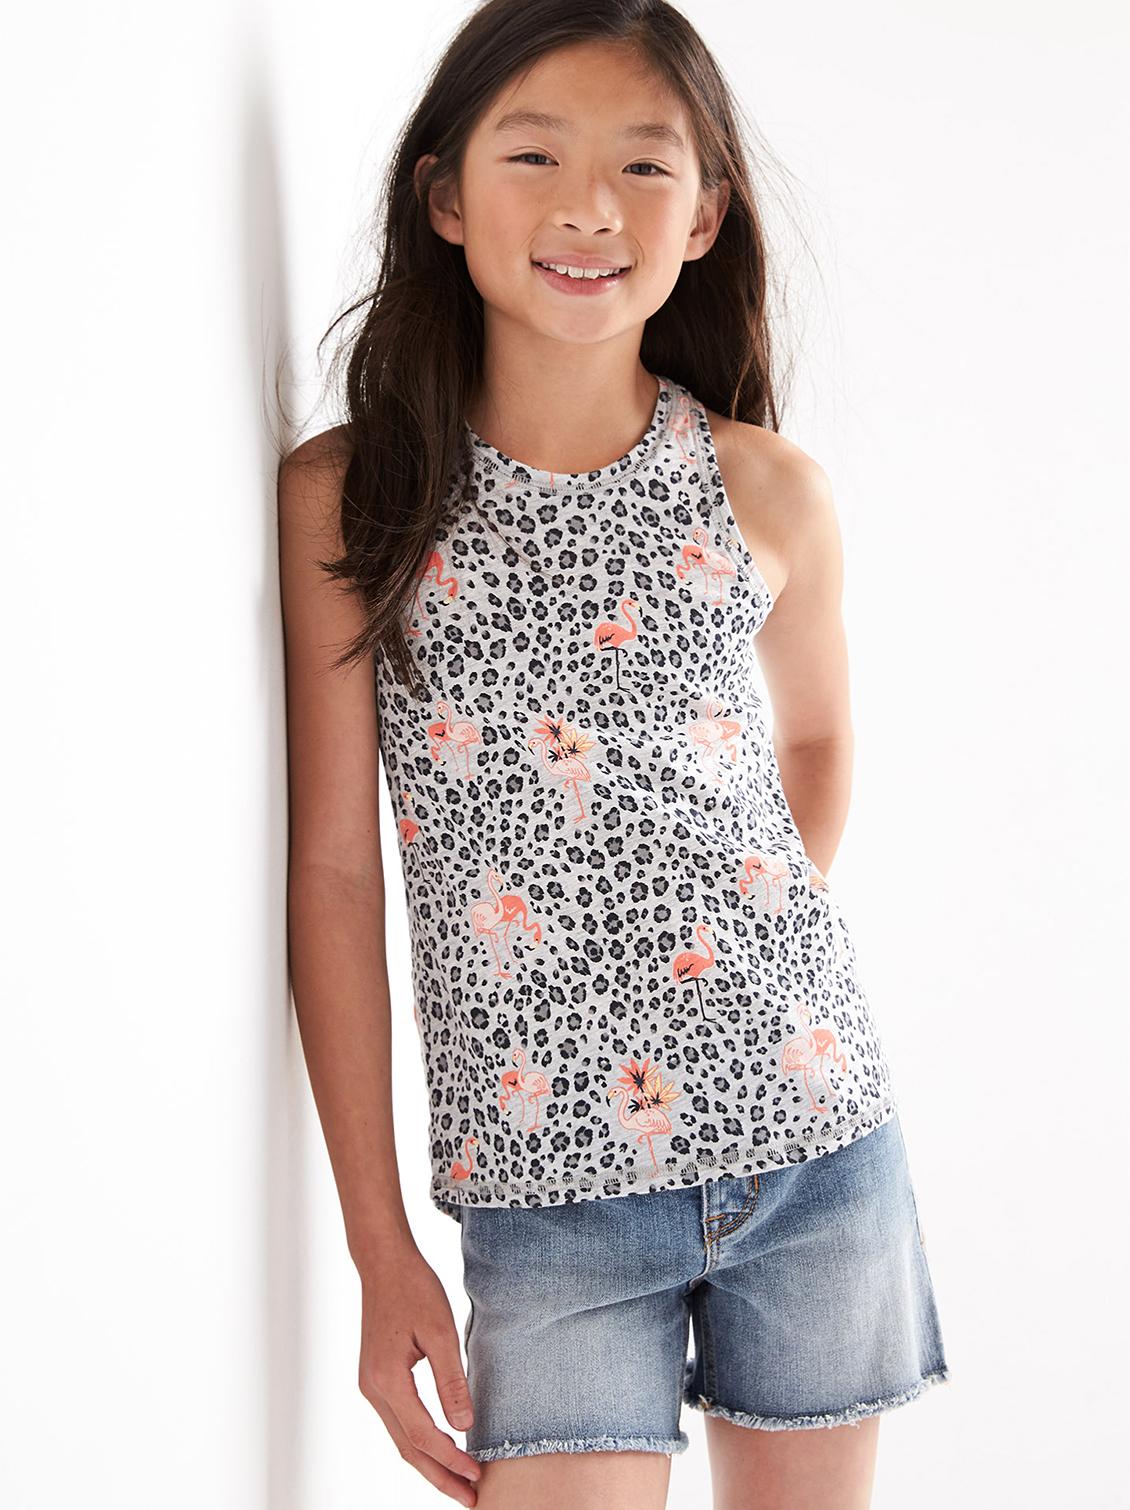 smiling girl kid art director